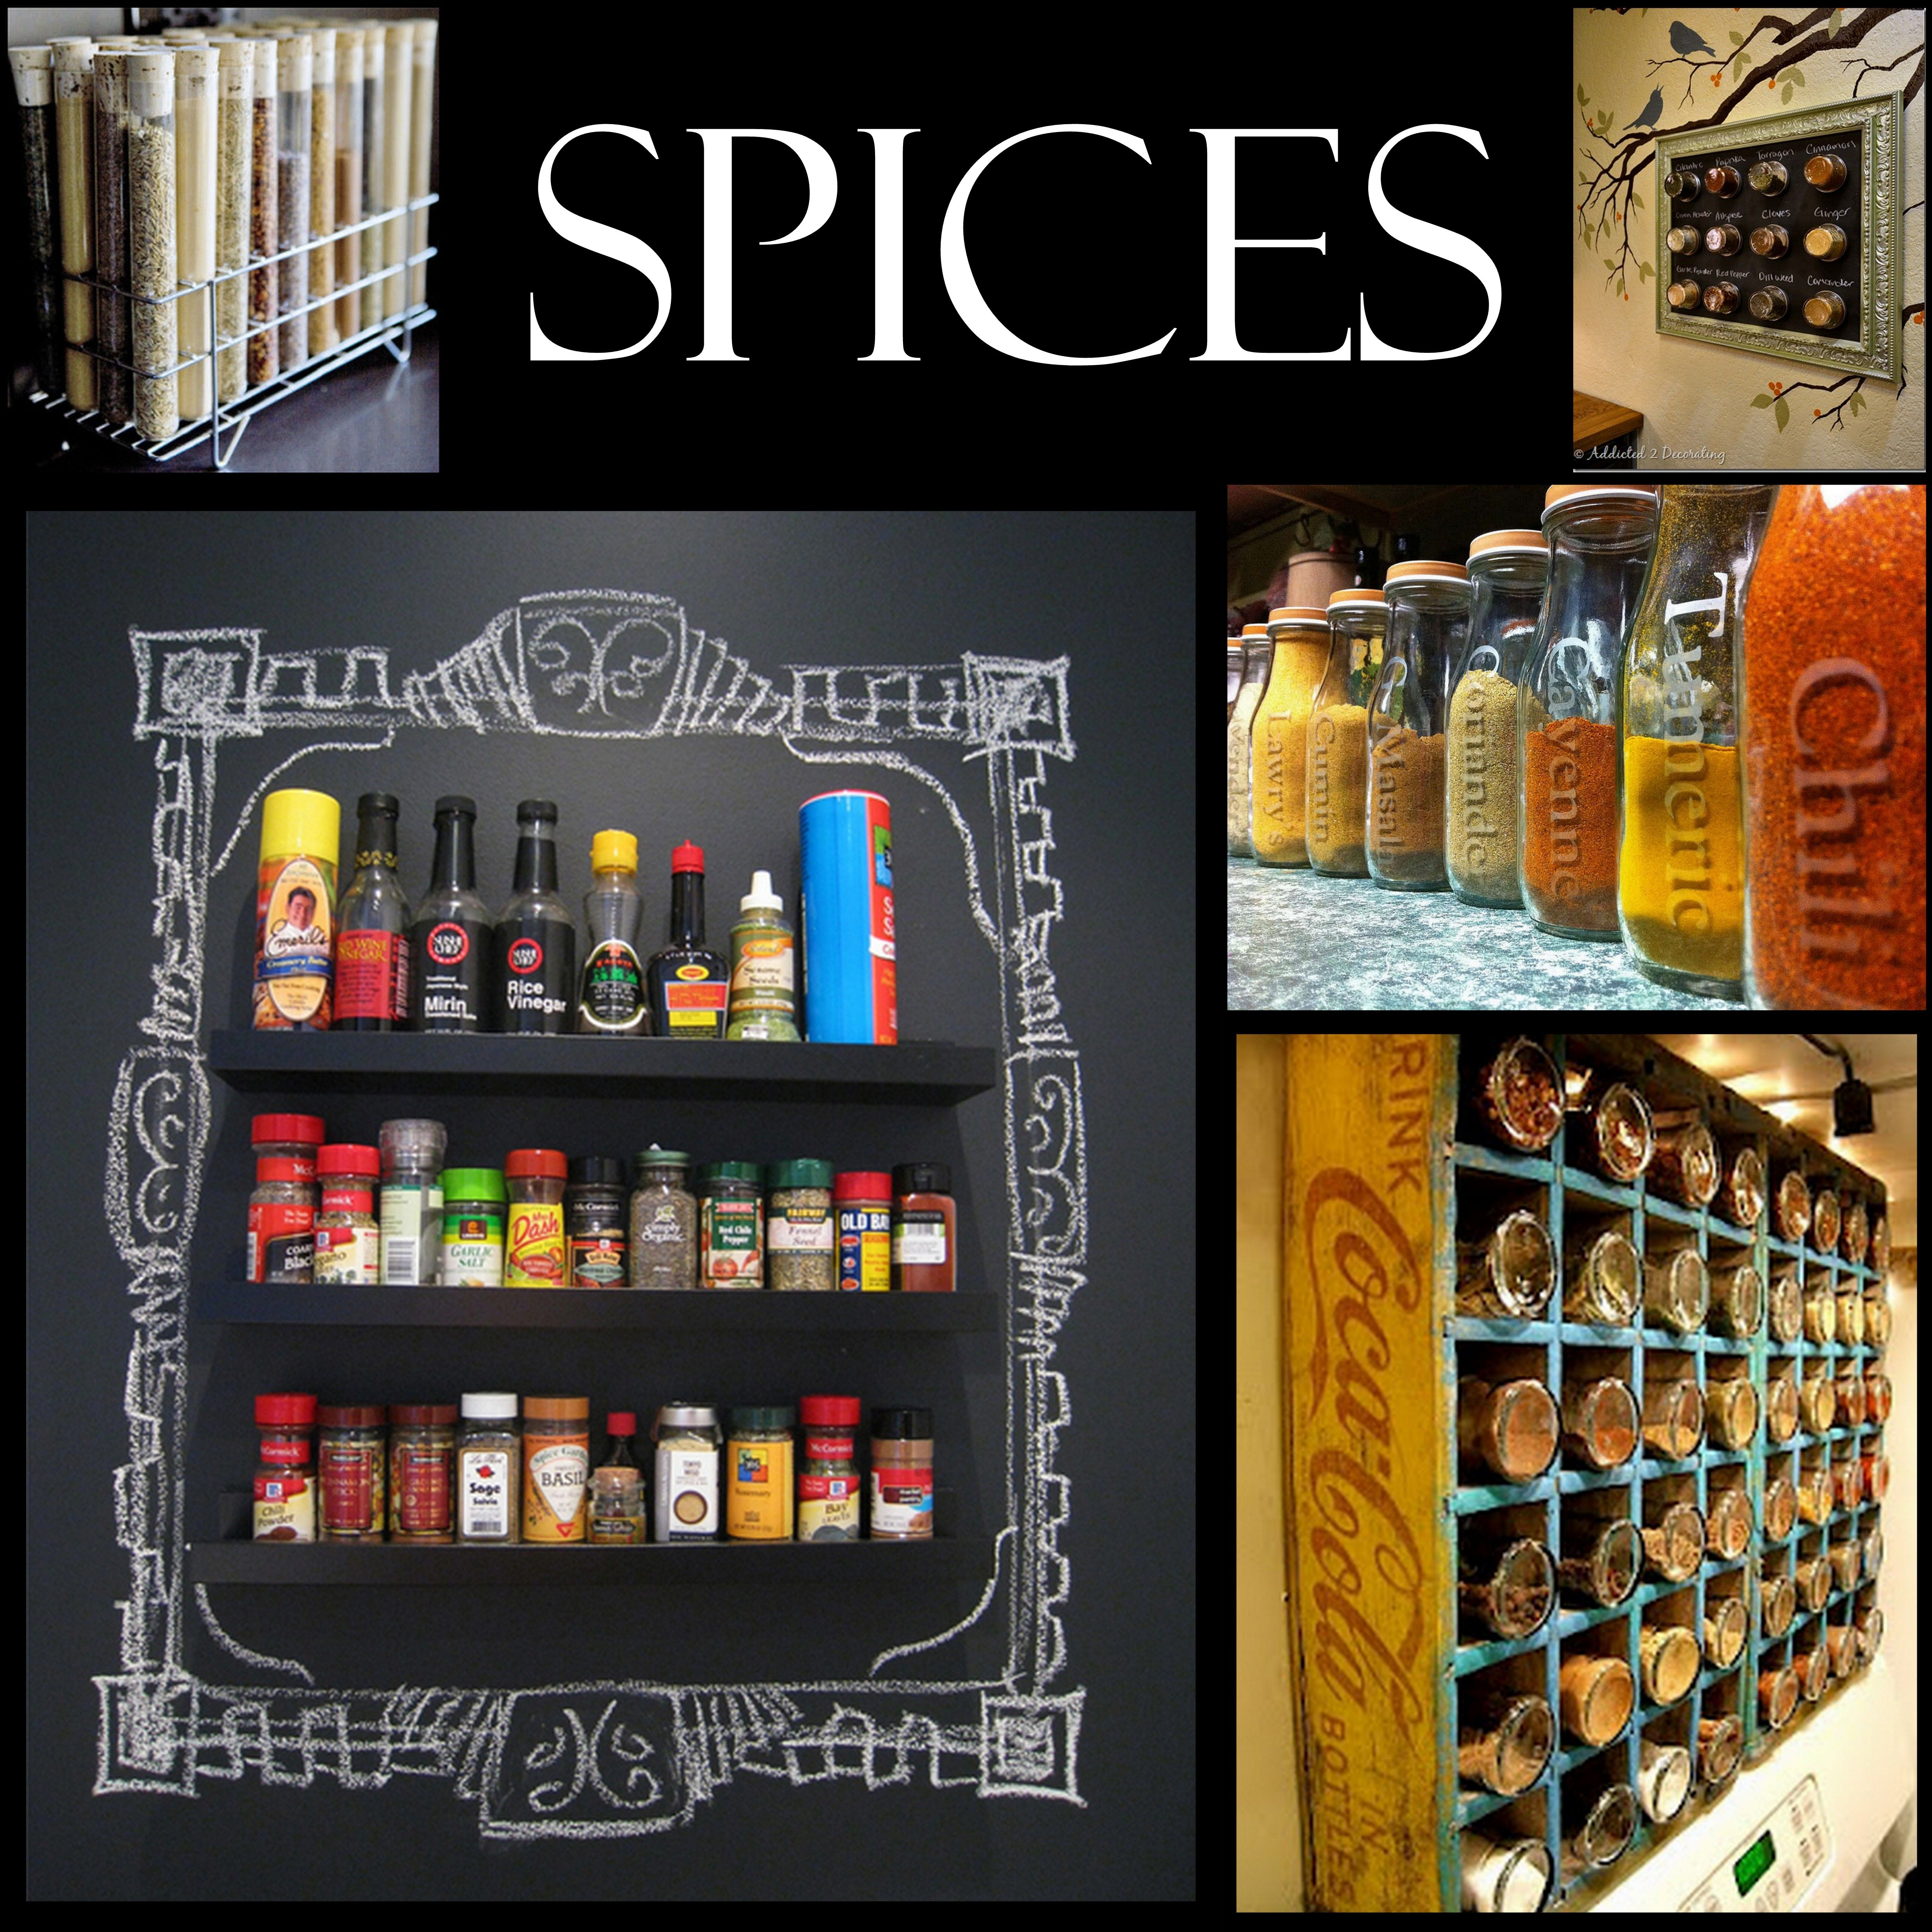 Spice Storage And Organizing Inspiration